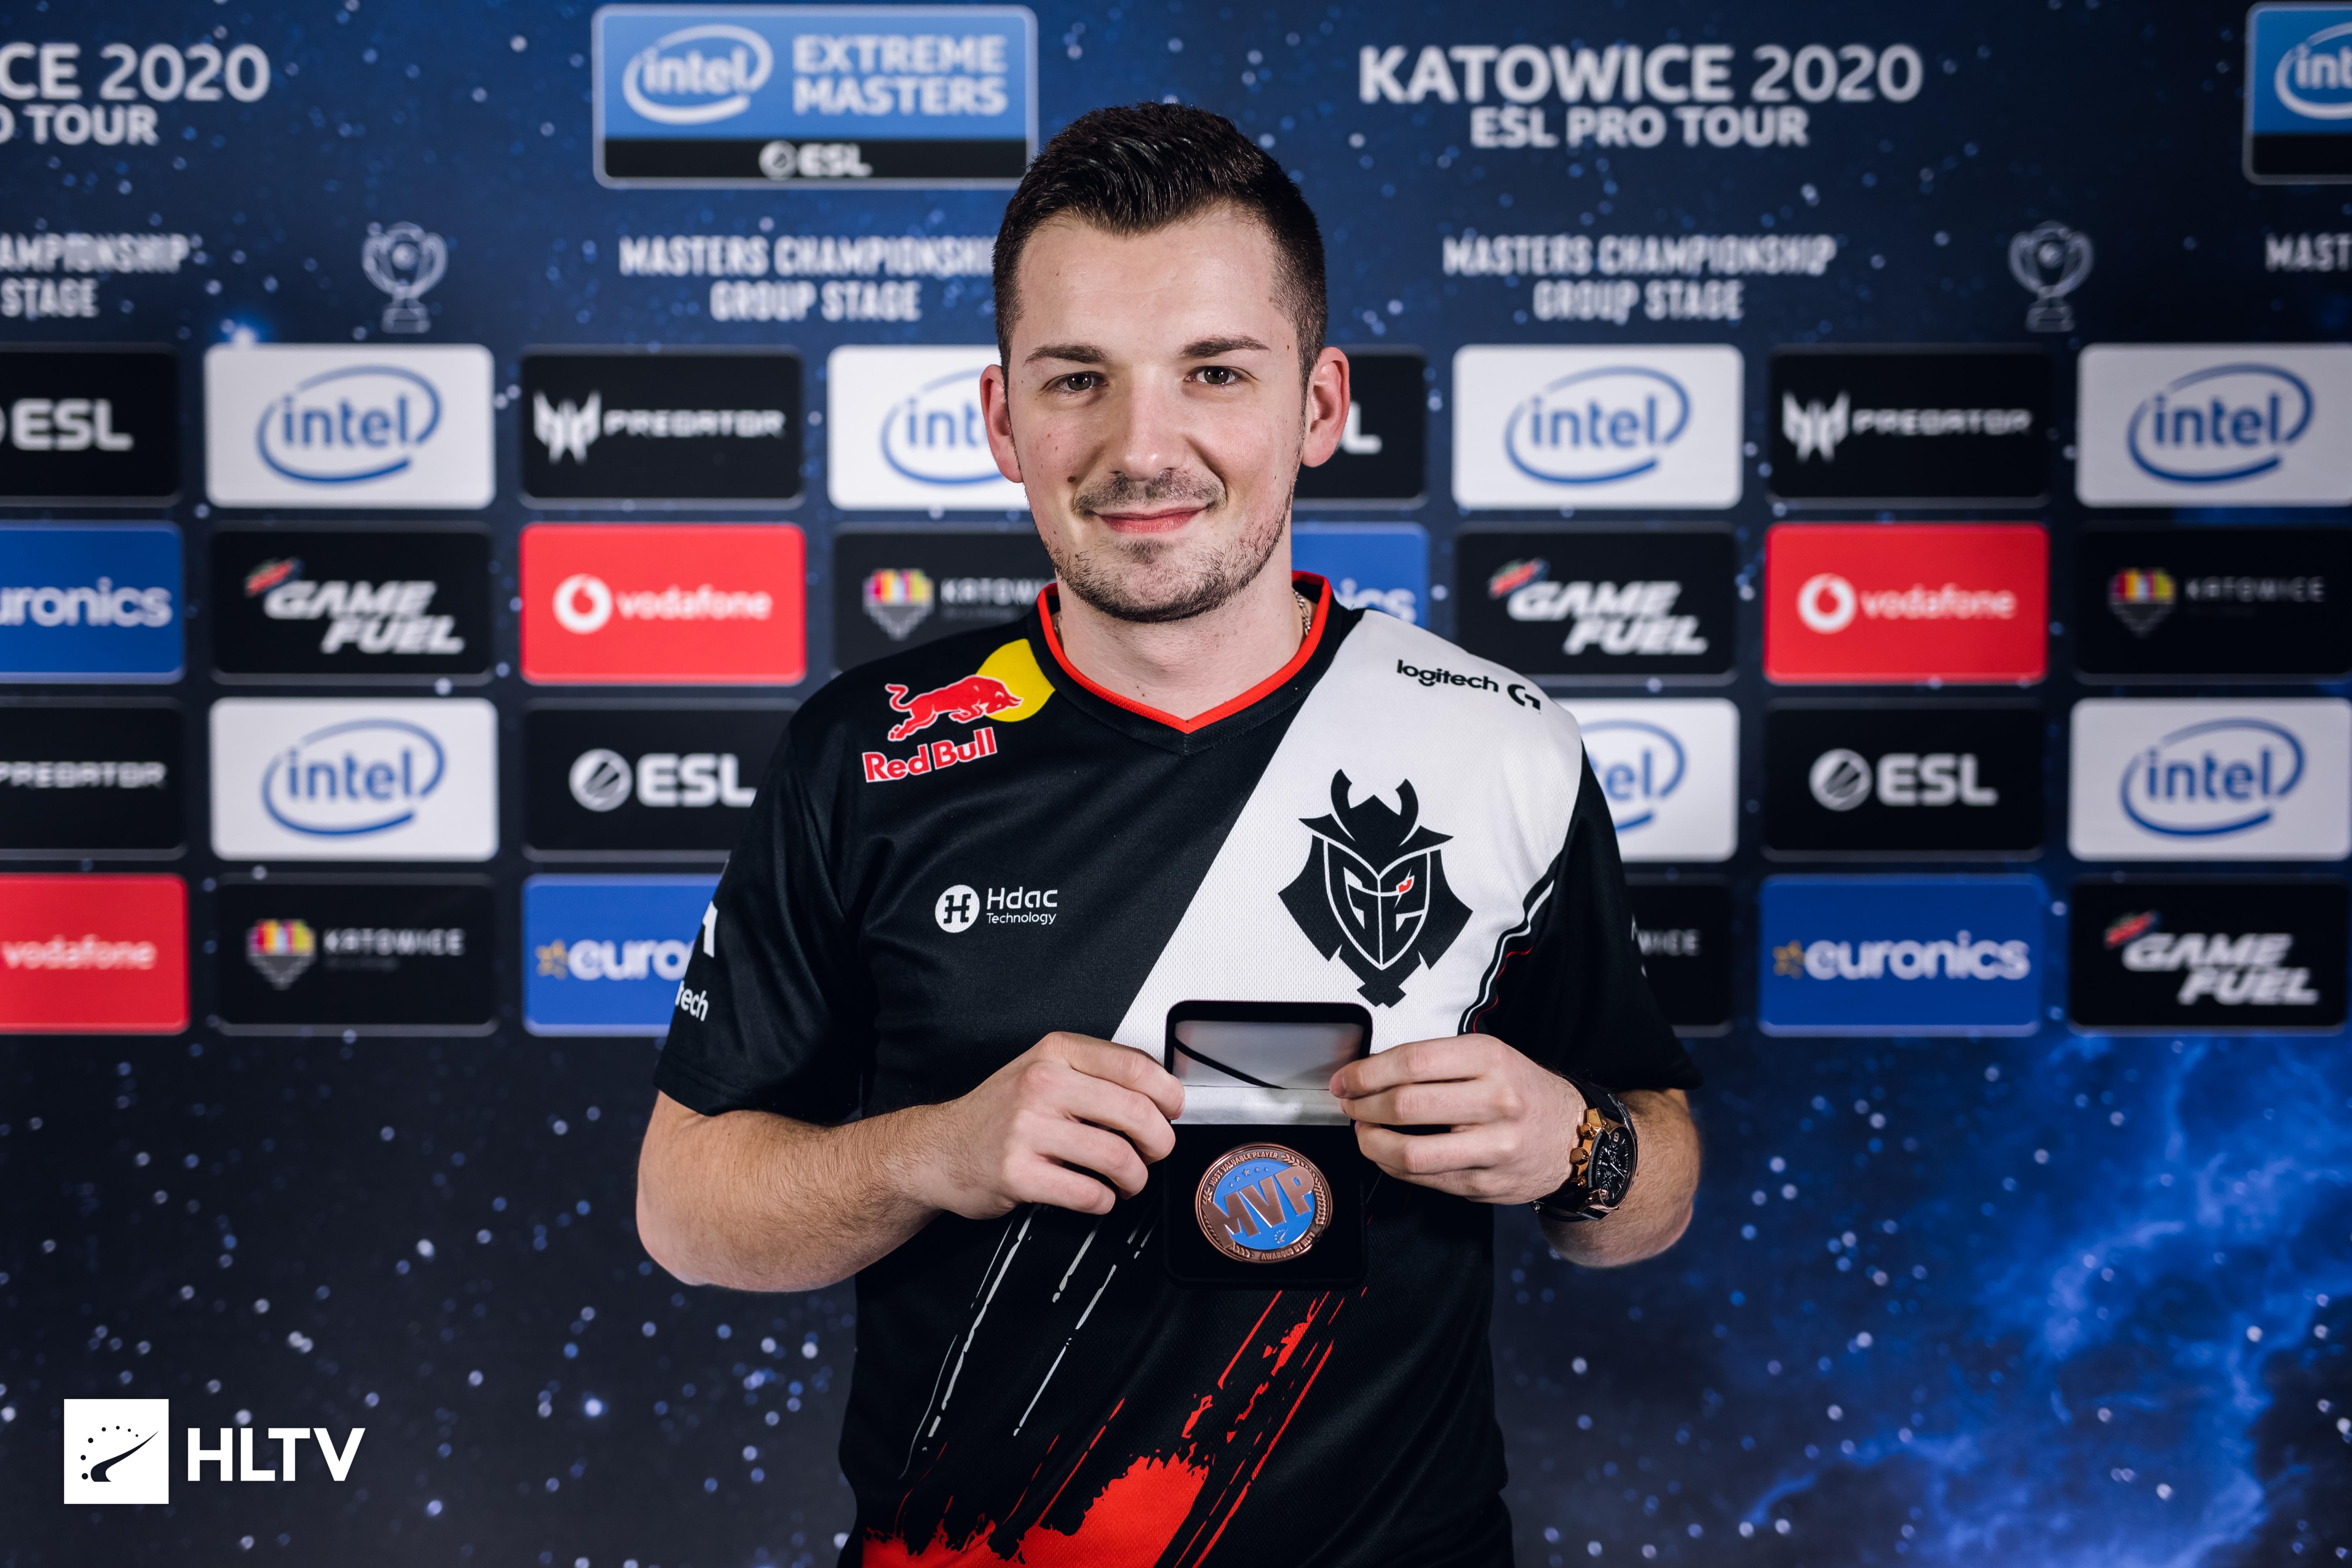 CS Summit, Никола «NiKo» Ковач, G2 Esports, Неманья «Hunter» Ковач